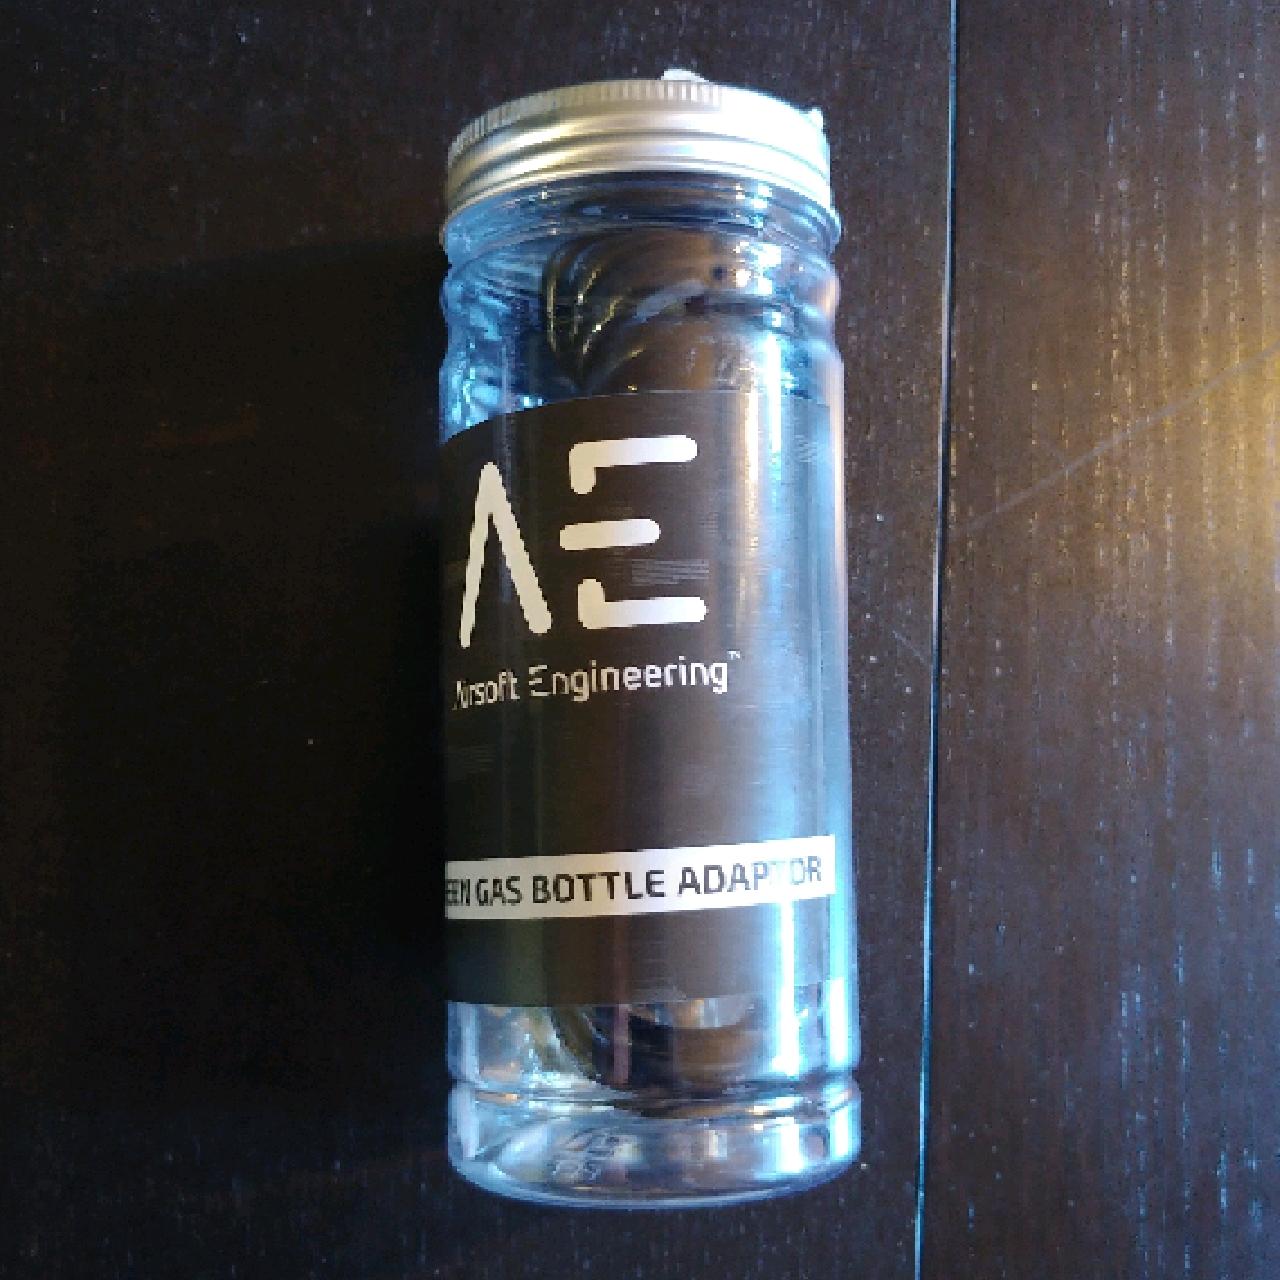 AE magasinadapter gröngas